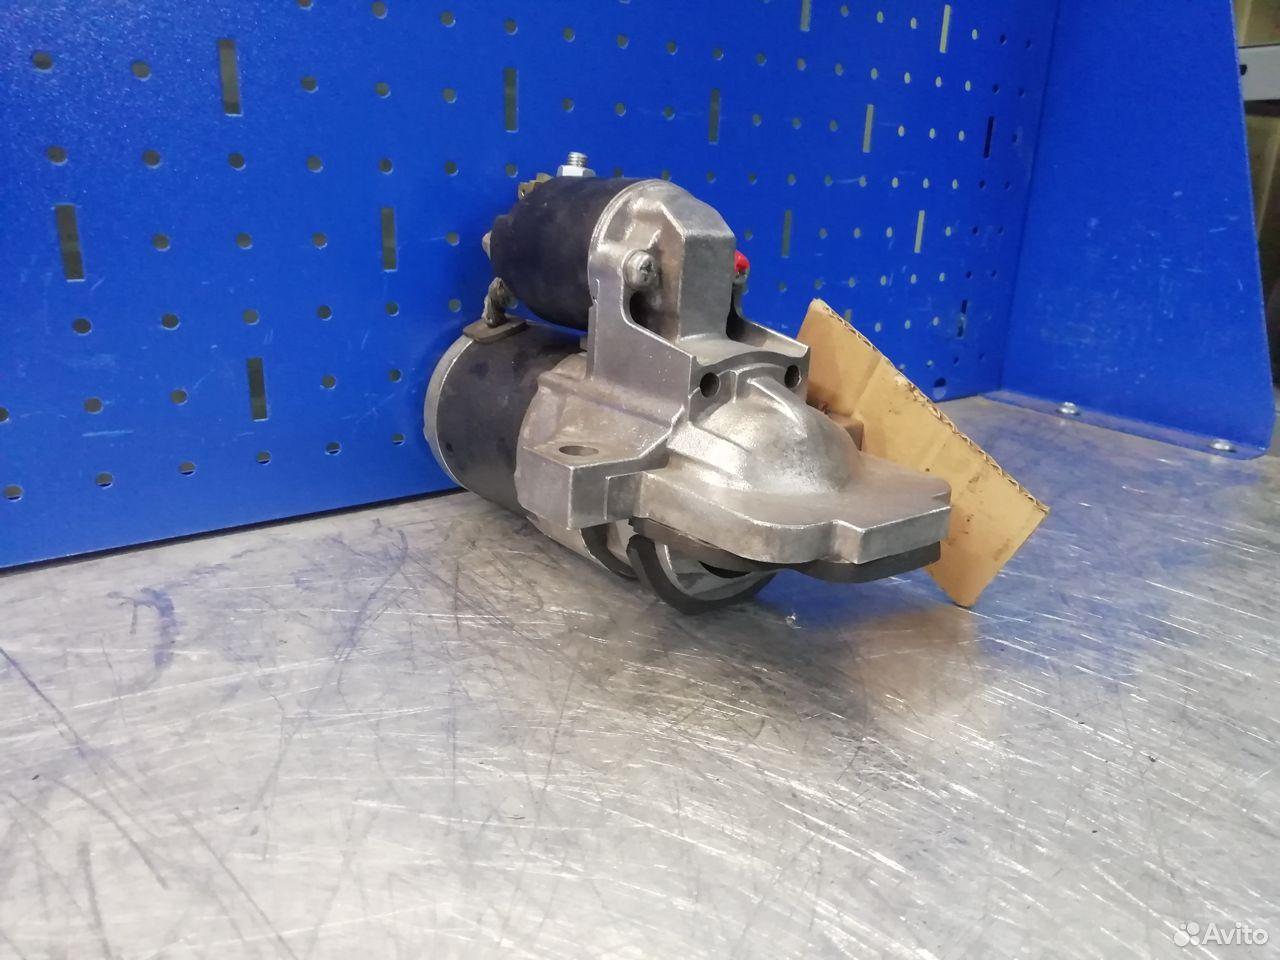 Стартер Mazda CX-7, Mazda 6 GH  89624532525 купить 1